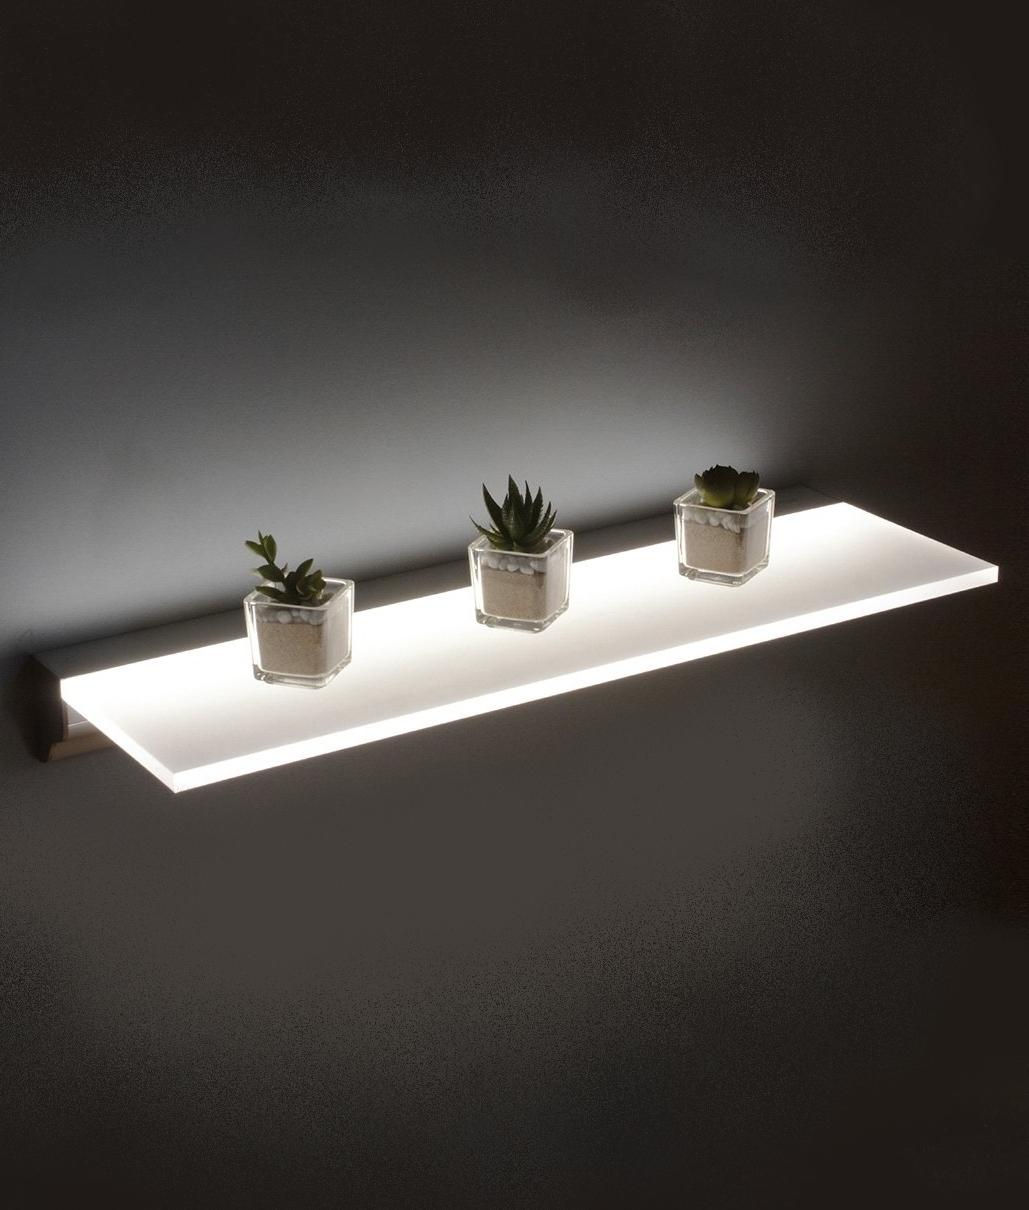 Led Opal Illuminated Shelf Two Sizes Intended For Illuminated Glass Shelves (View 2 of 15)